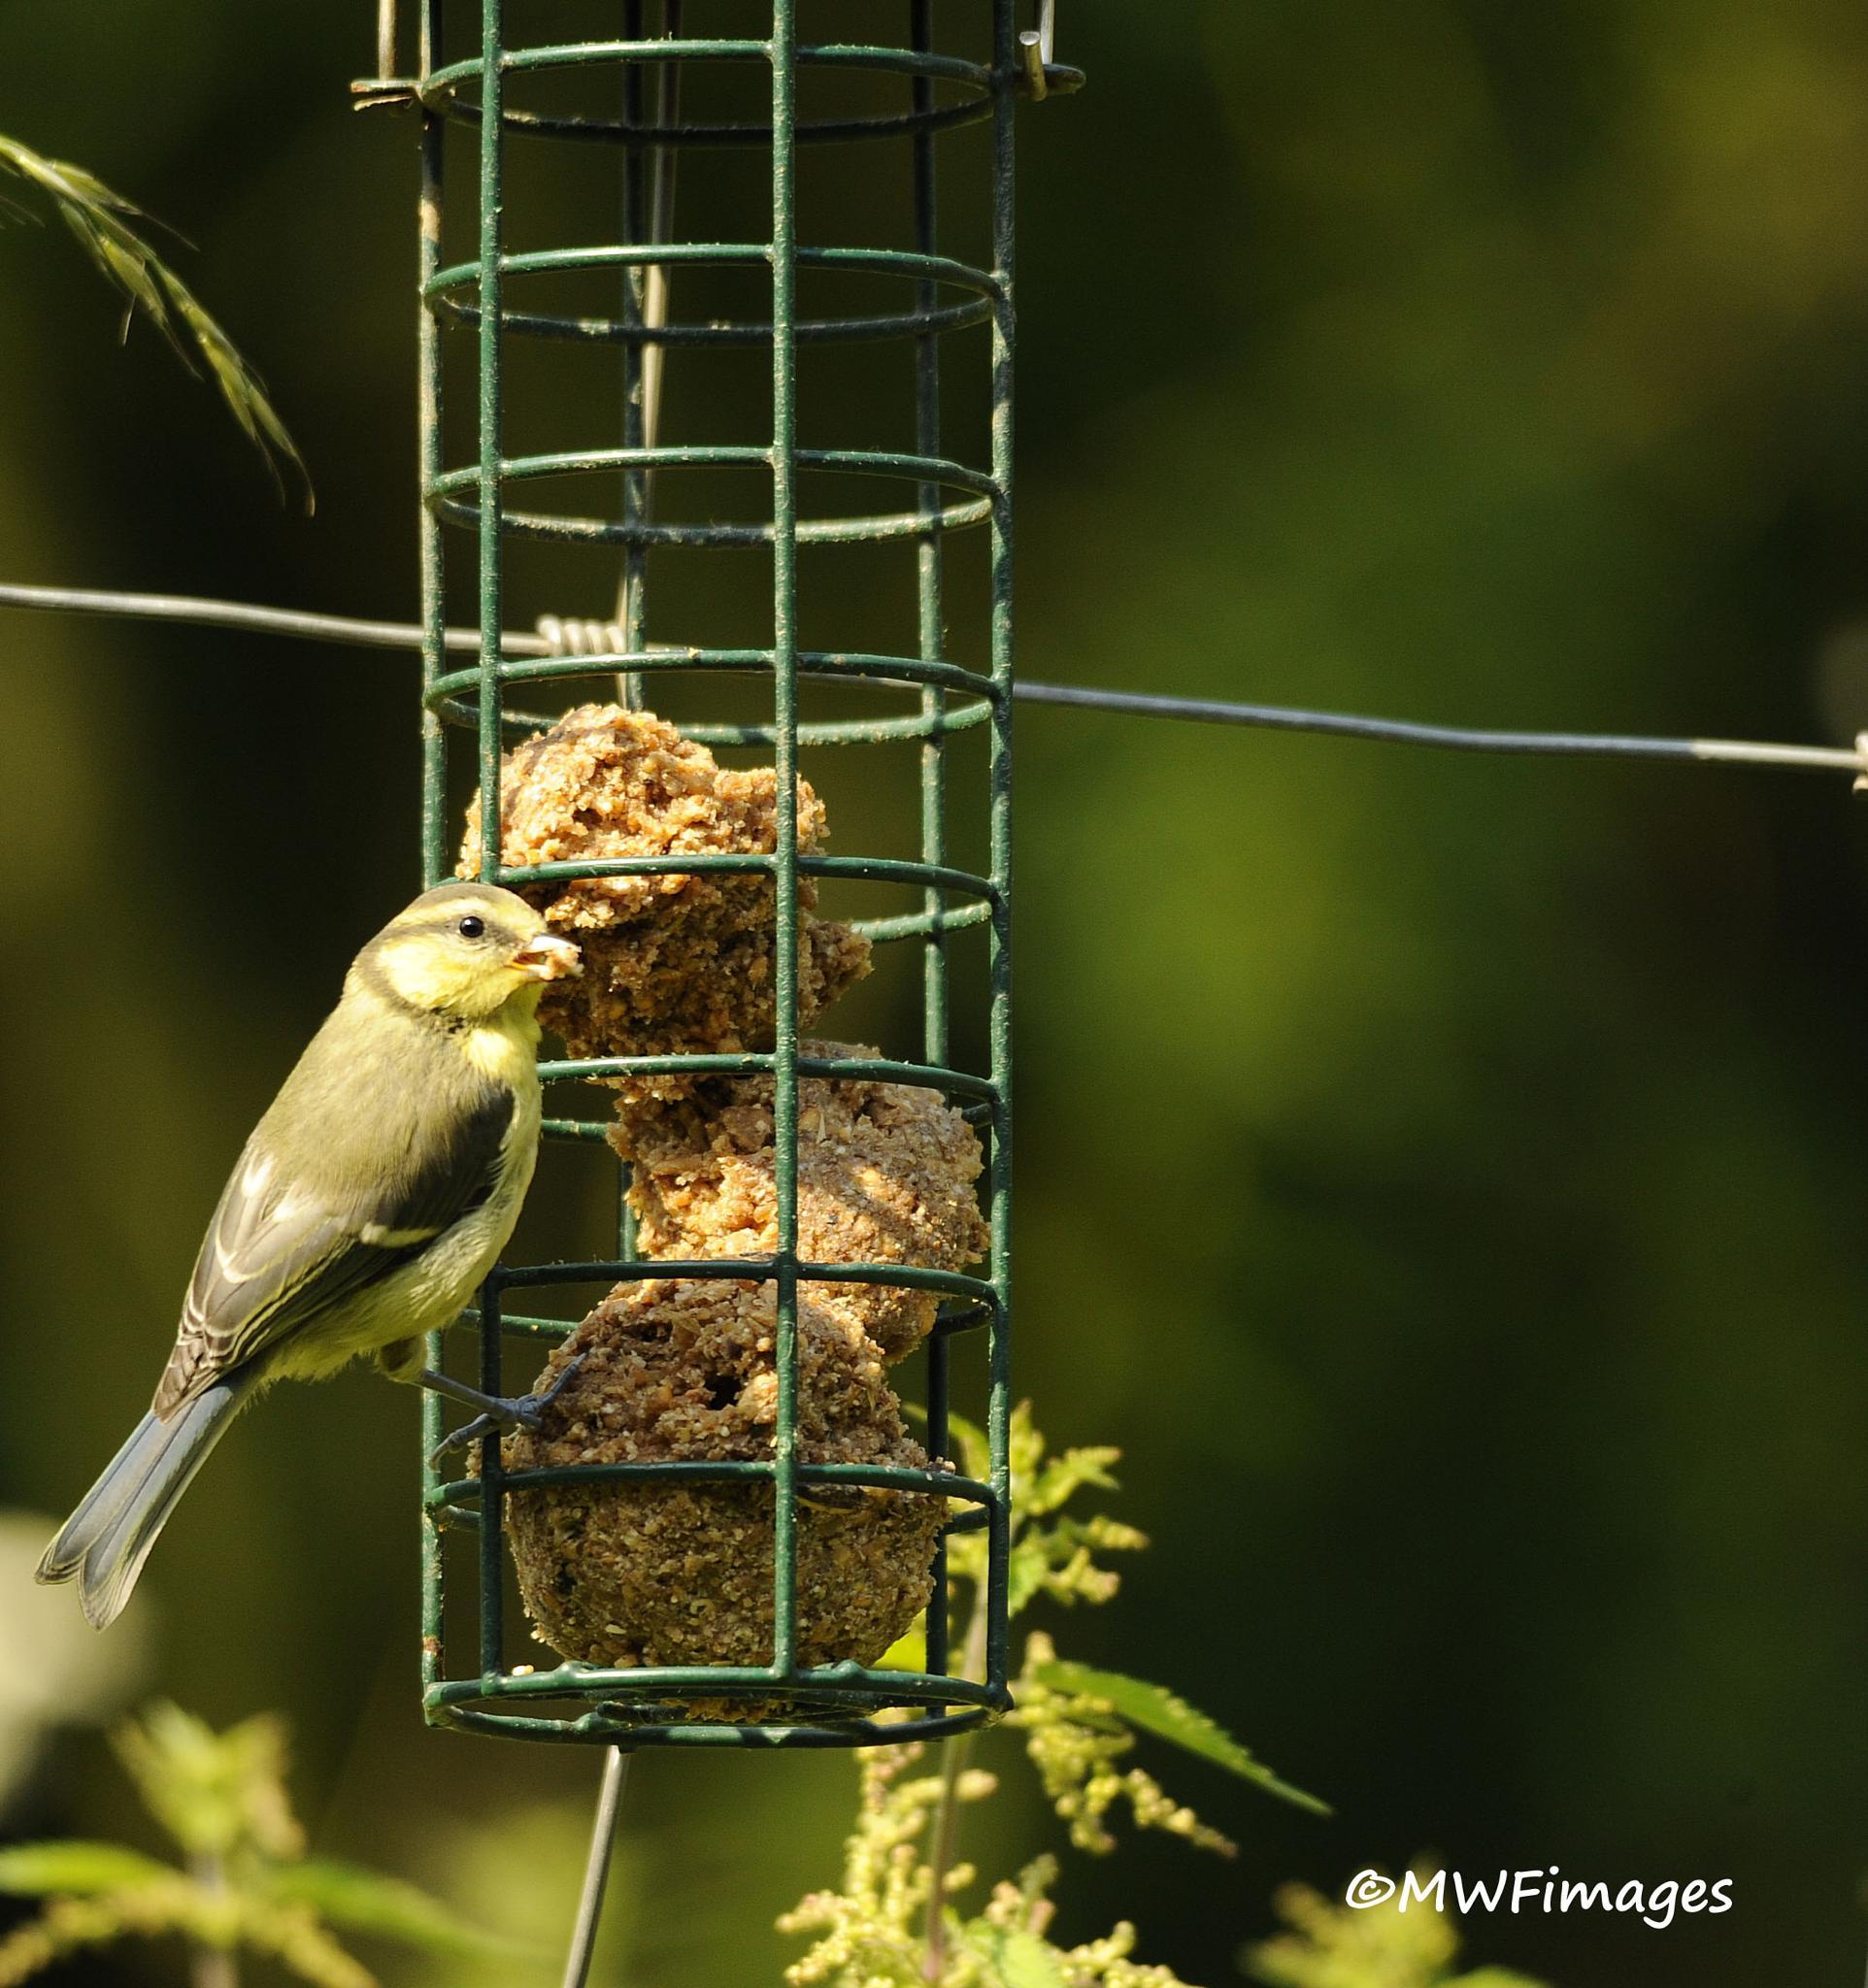 Green Finch by martinfairbairn178